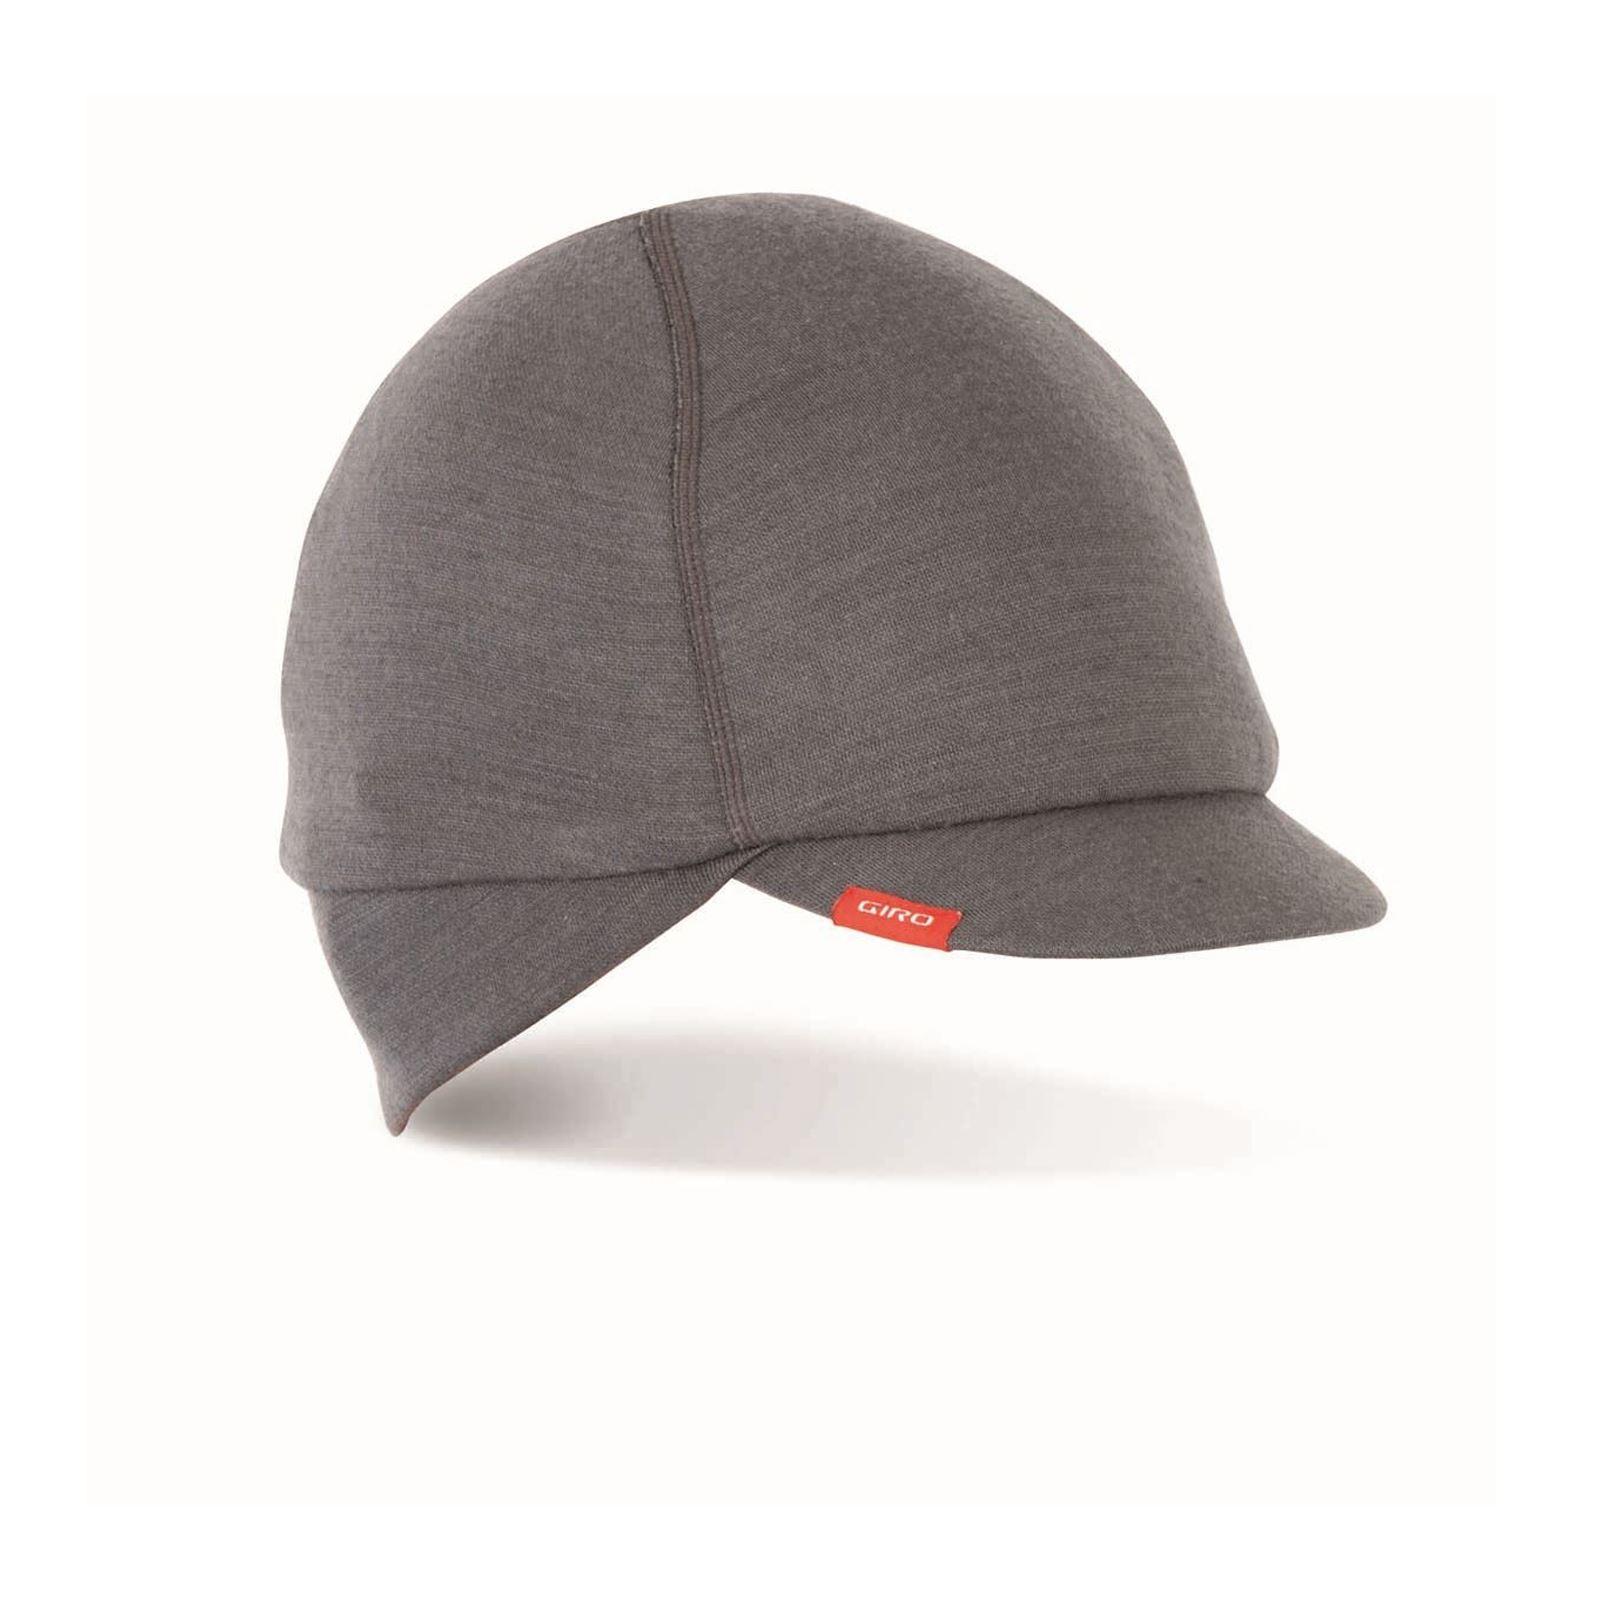 e287fc593 Details about Cycling Cap Ear Flaps Giro Merino Wool Under Helmet Charcoal  S-M 51-57Cm